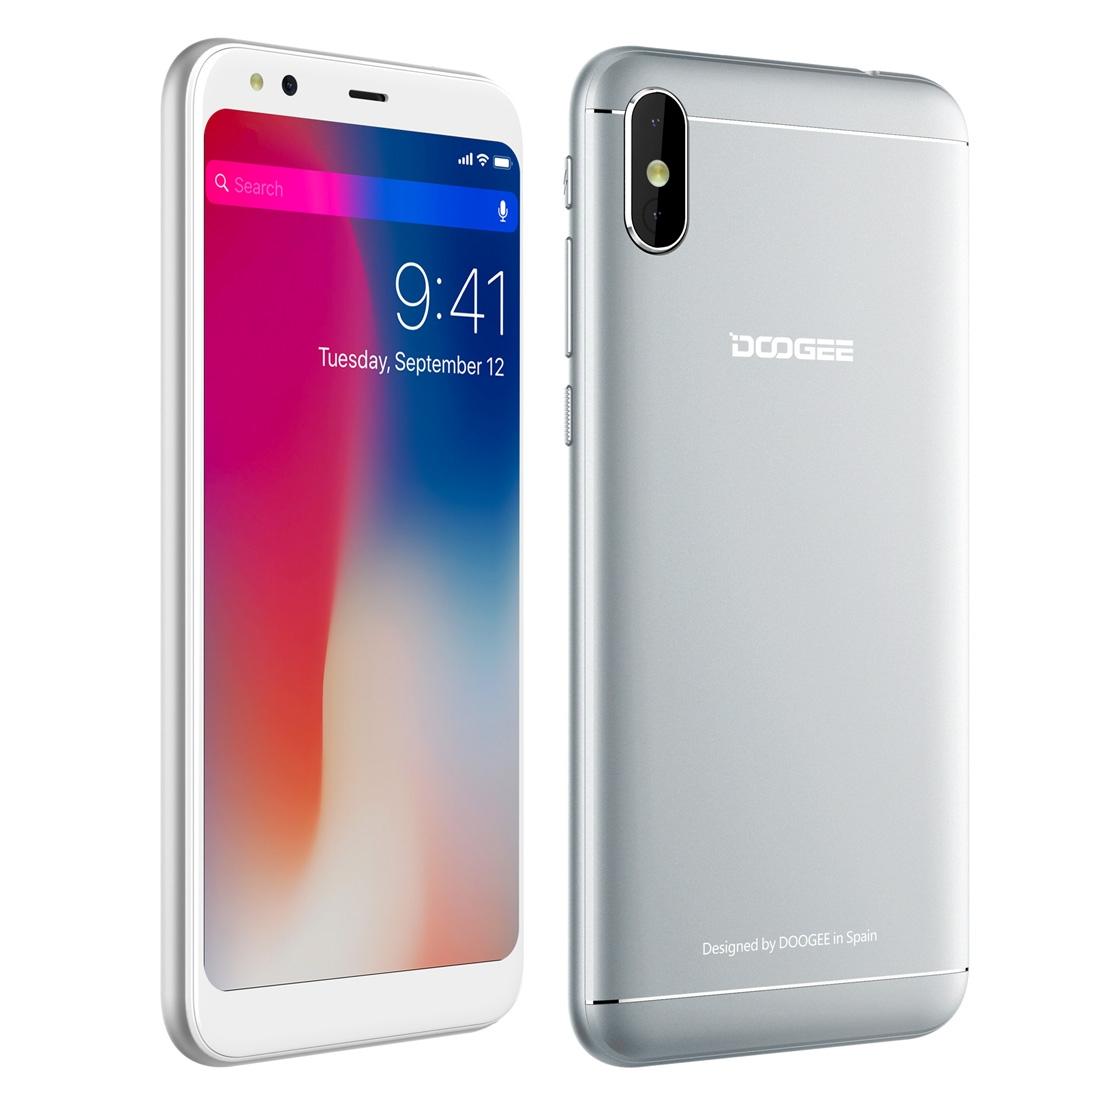 Проектор Смартфон DOOGEE X53 1GB+16GB Двойная задняя камера 5.3 дюйма Android 7.0 MTK6580M 4 ядра до 1.3GHz 3G OTA Две SIM (Серебряный) (Фото 3)